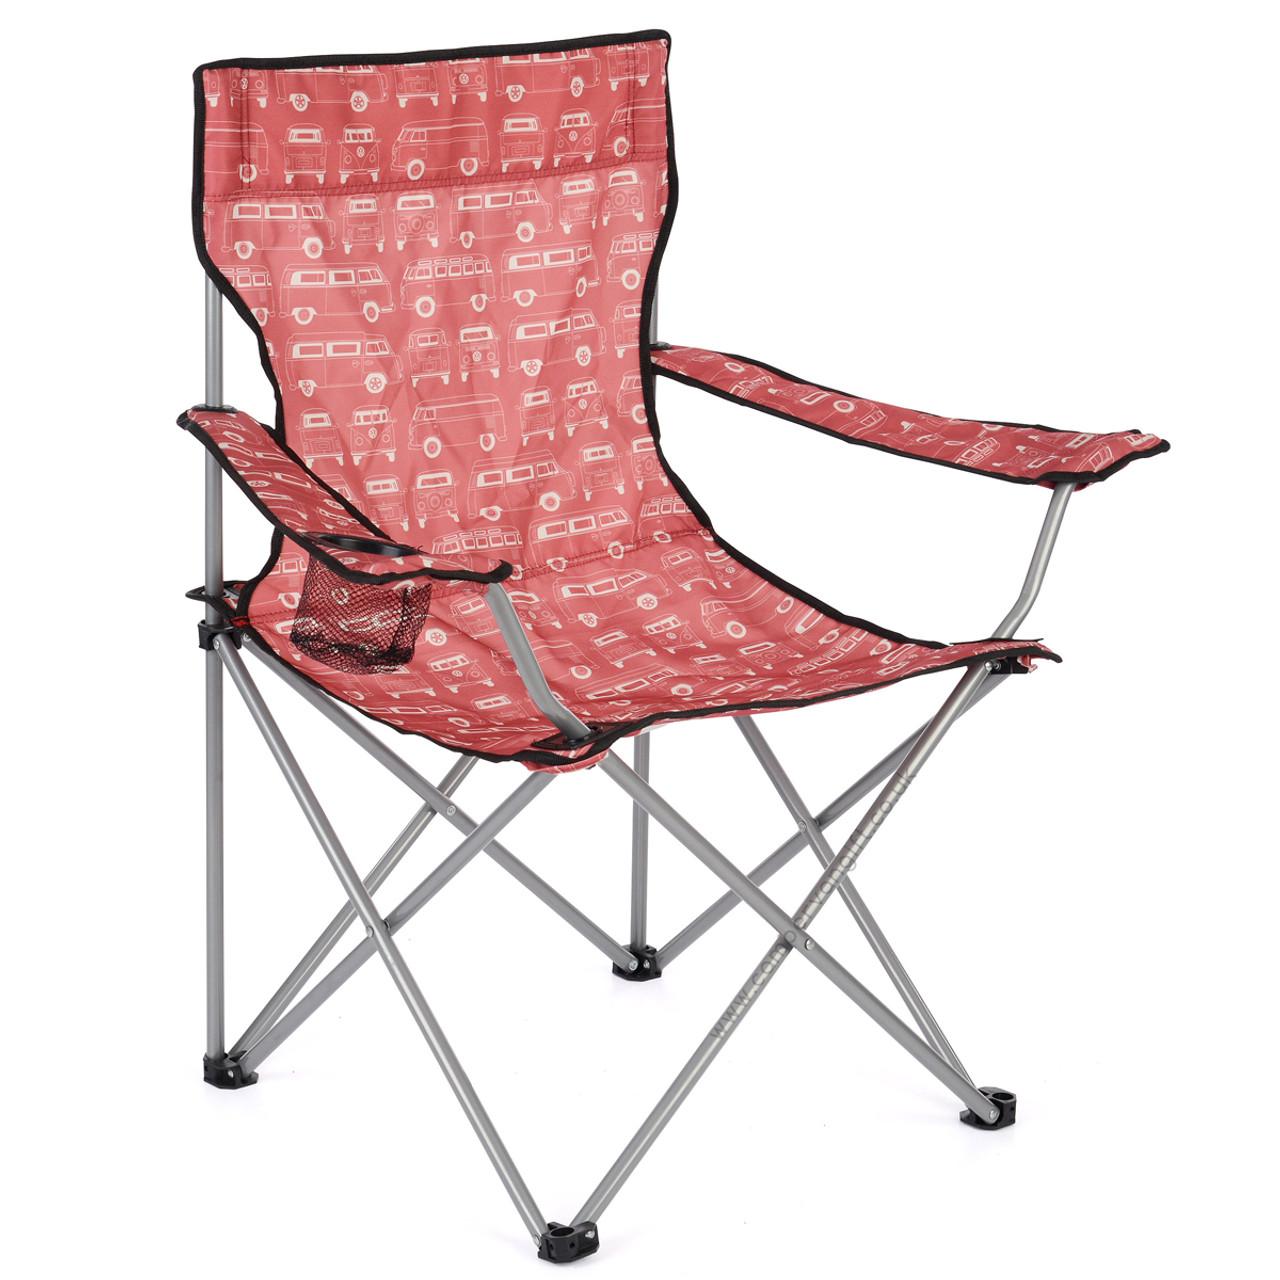 Pleasant Volkswagen Campervan Red Beach Folding Camping Chair Cjindustries Chair Design For Home Cjindustriesco